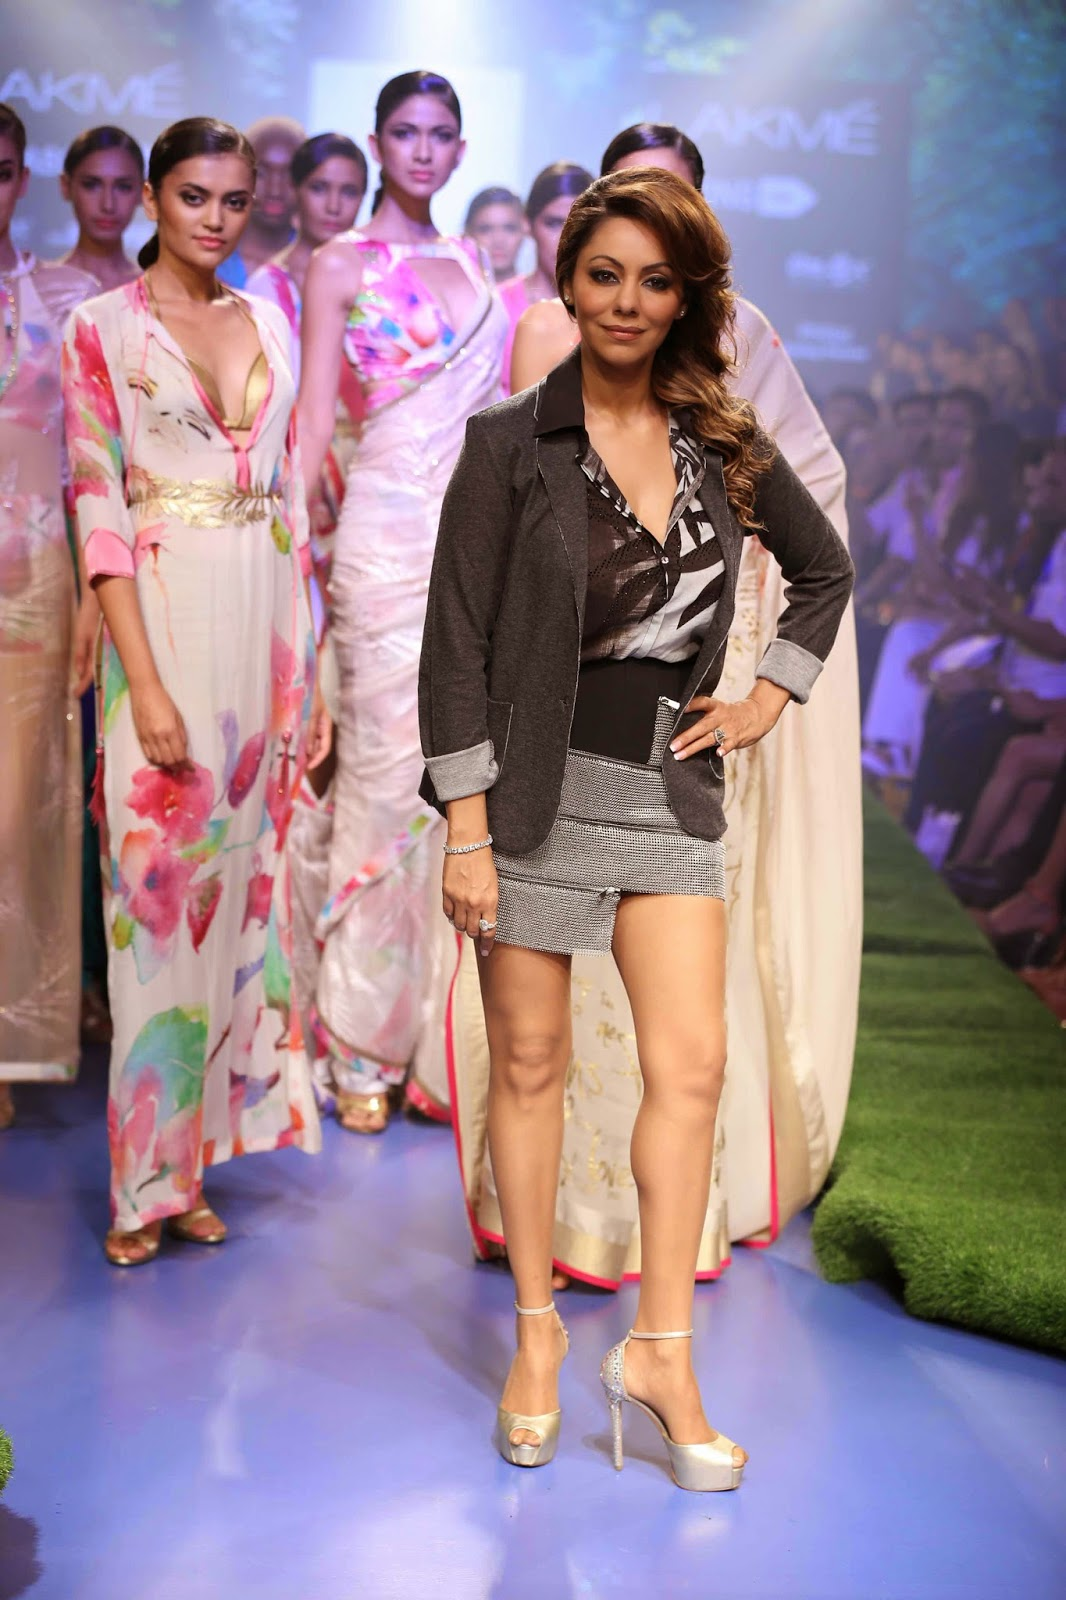 http://aquaintperspective.blogspot.in/,GAURI KHAN for SATYA PAUL